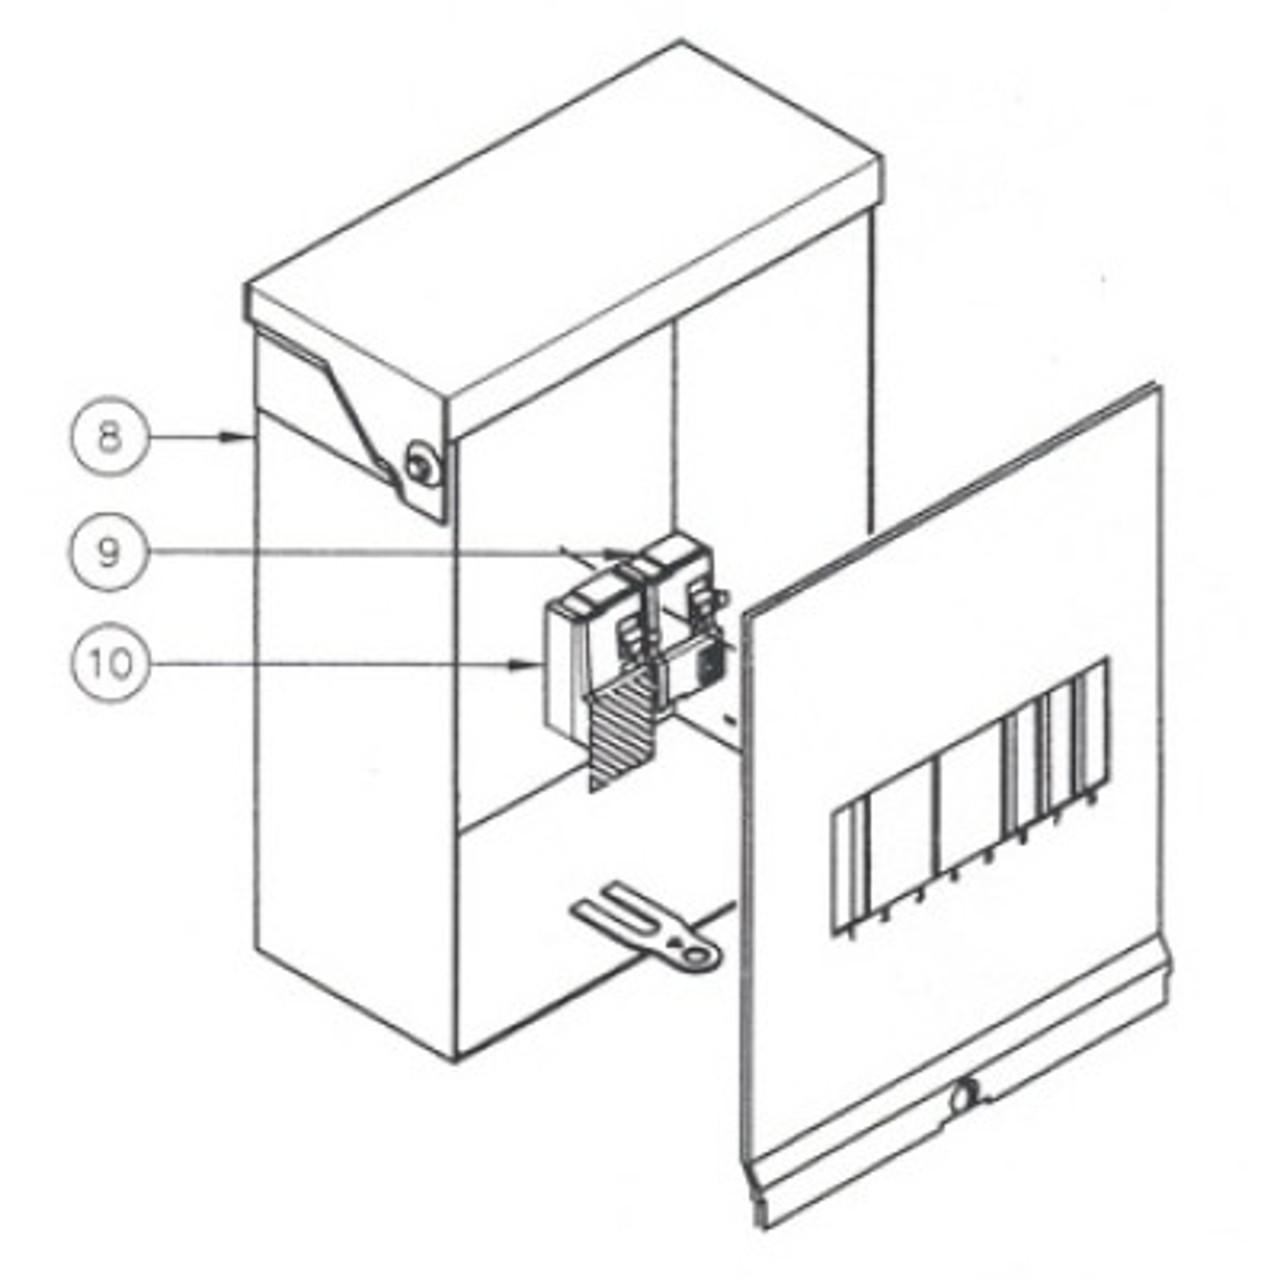 Caldera Spas 5 Wire GFCI (1) 30Amp & (1) 20Amp Breaker - 301757 - Spa Parts  DepotSpa Parts Depot